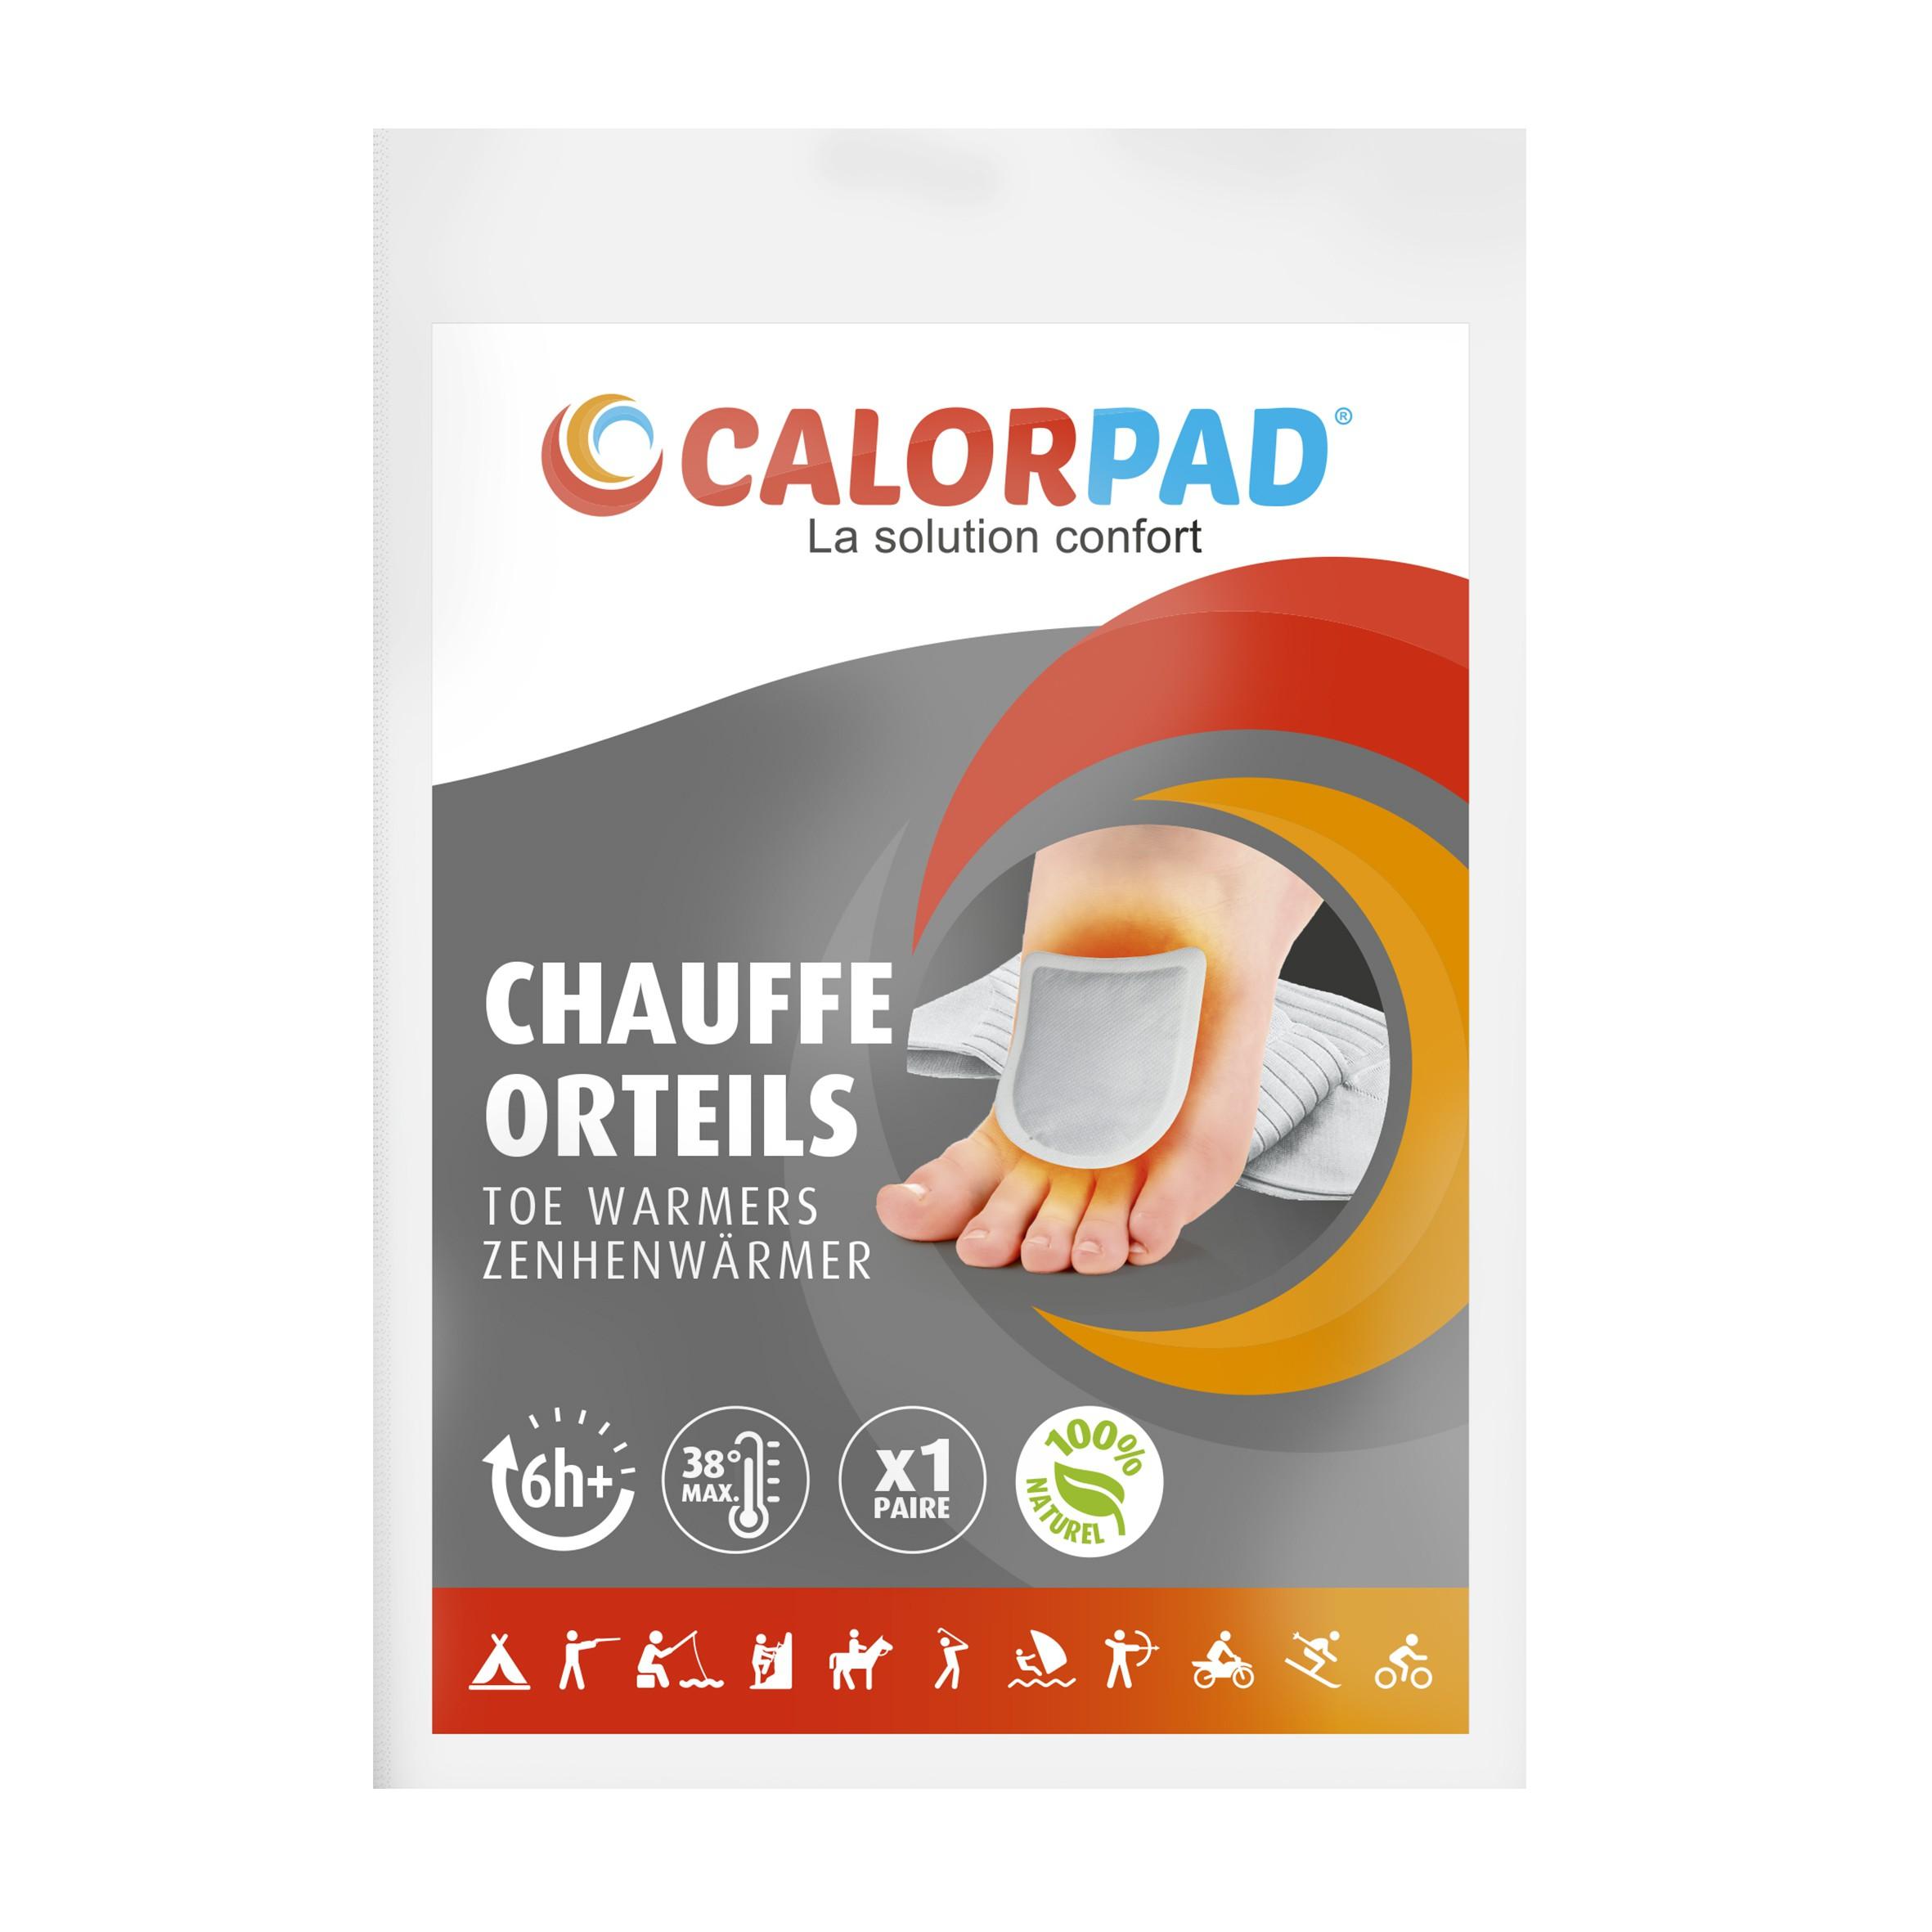 Calordpad Chauffe-Orteils